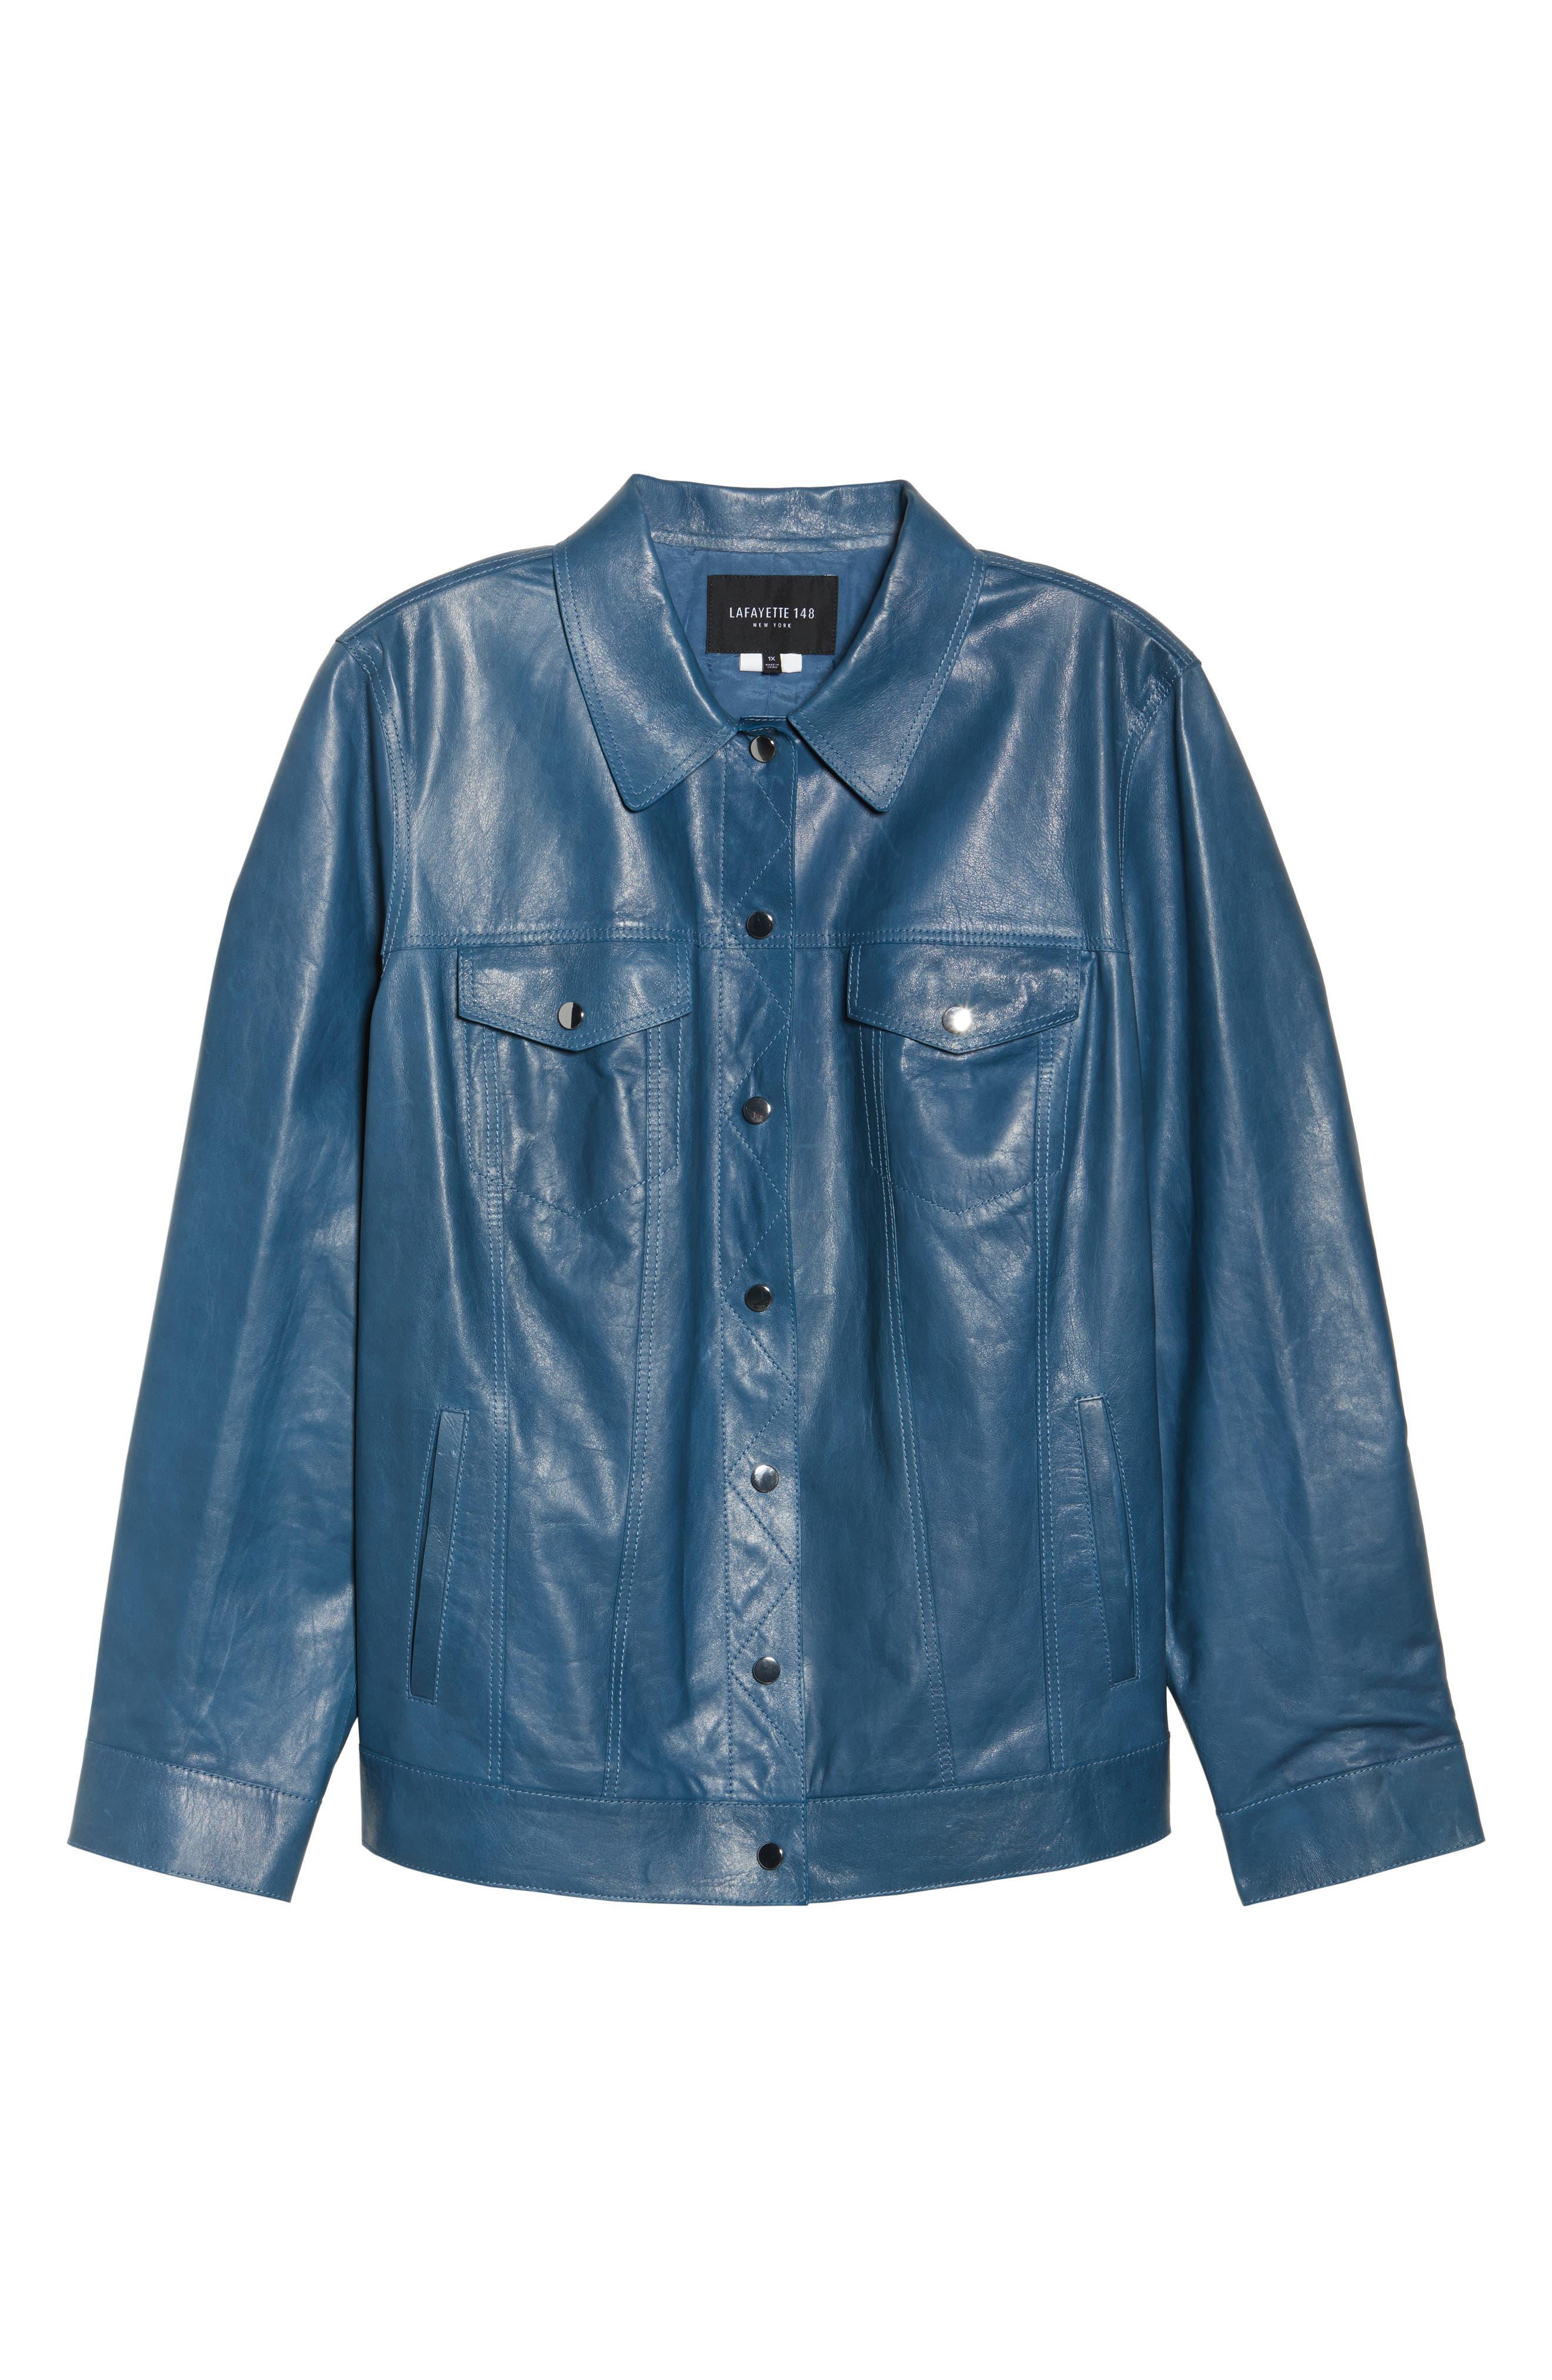 Destiny Leather Jacket,                             Alternate thumbnail 6, color,                             Placid Blue